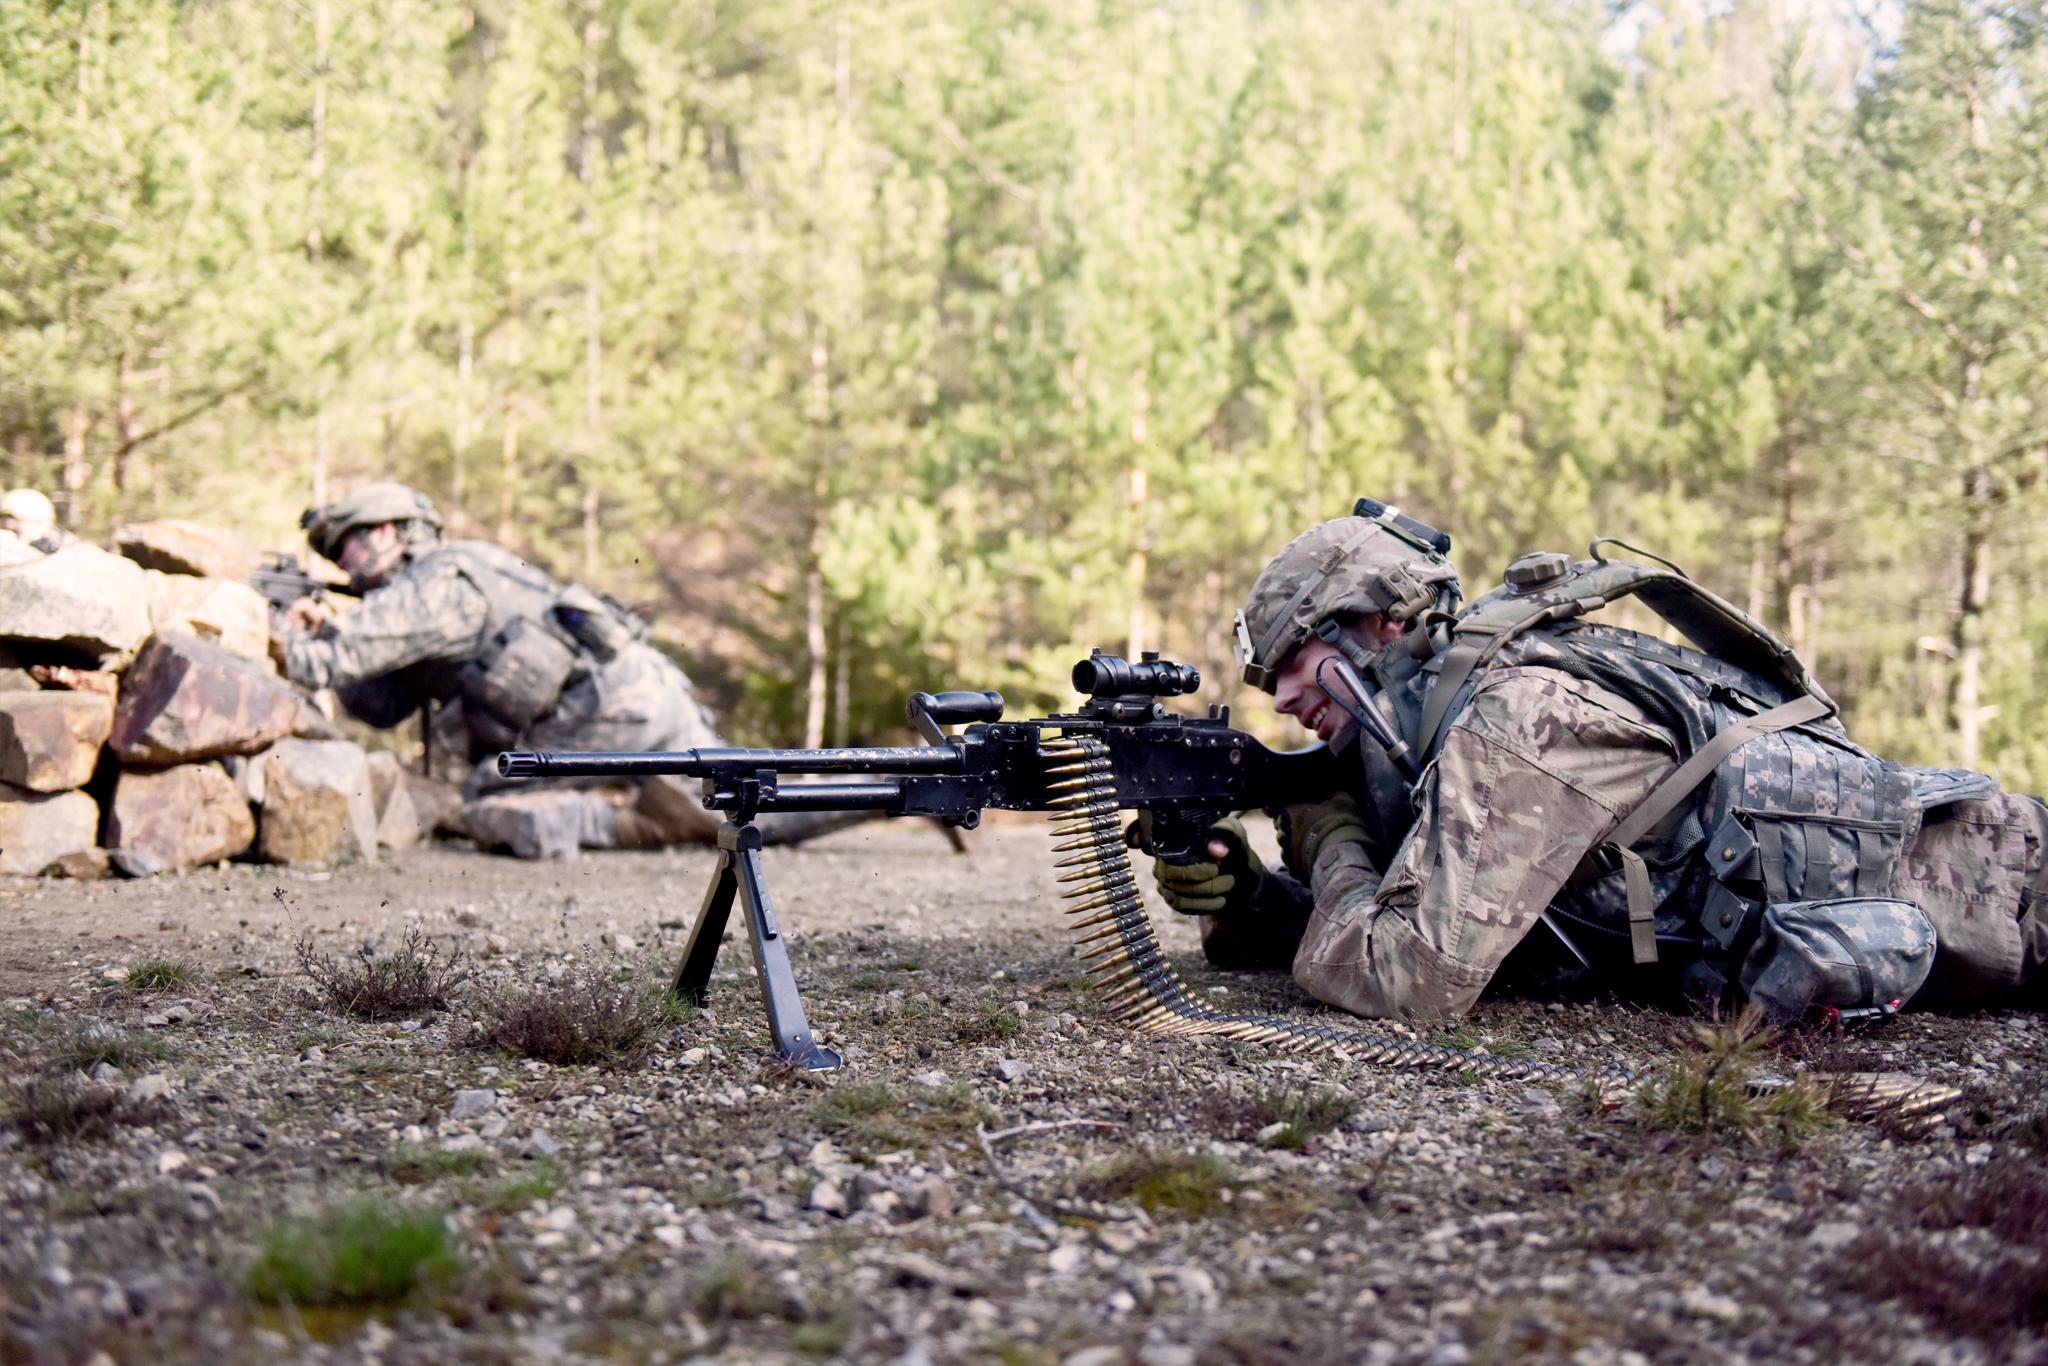 Machine gun team v akci. Zbraň je airsoftová verze kulometu M240b